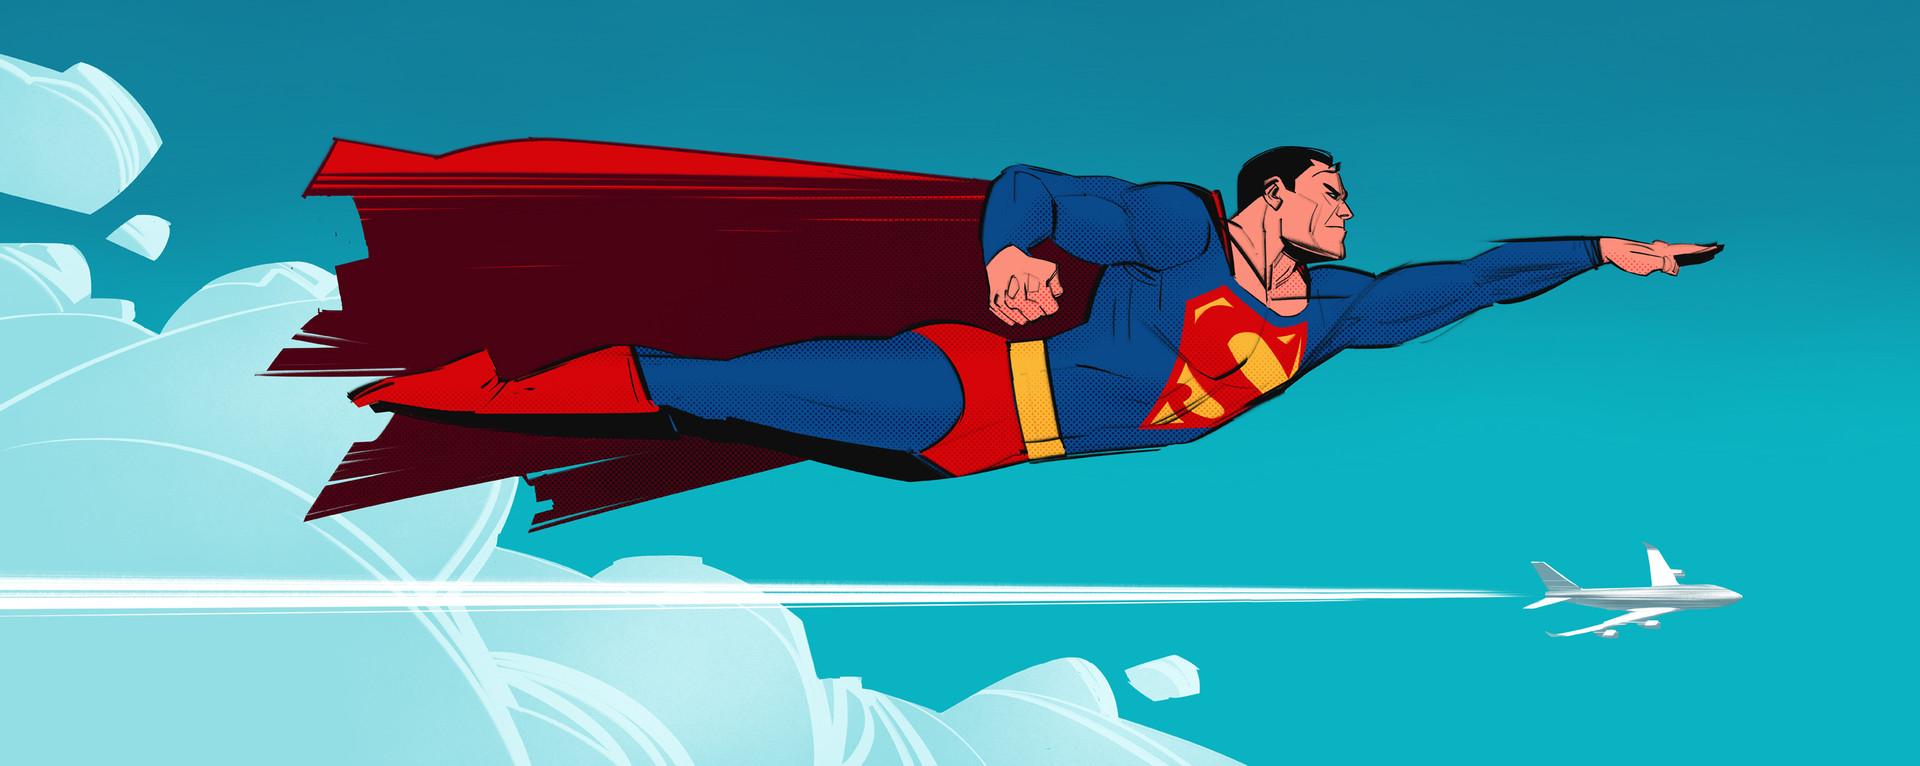 Renaud roche superman01 def